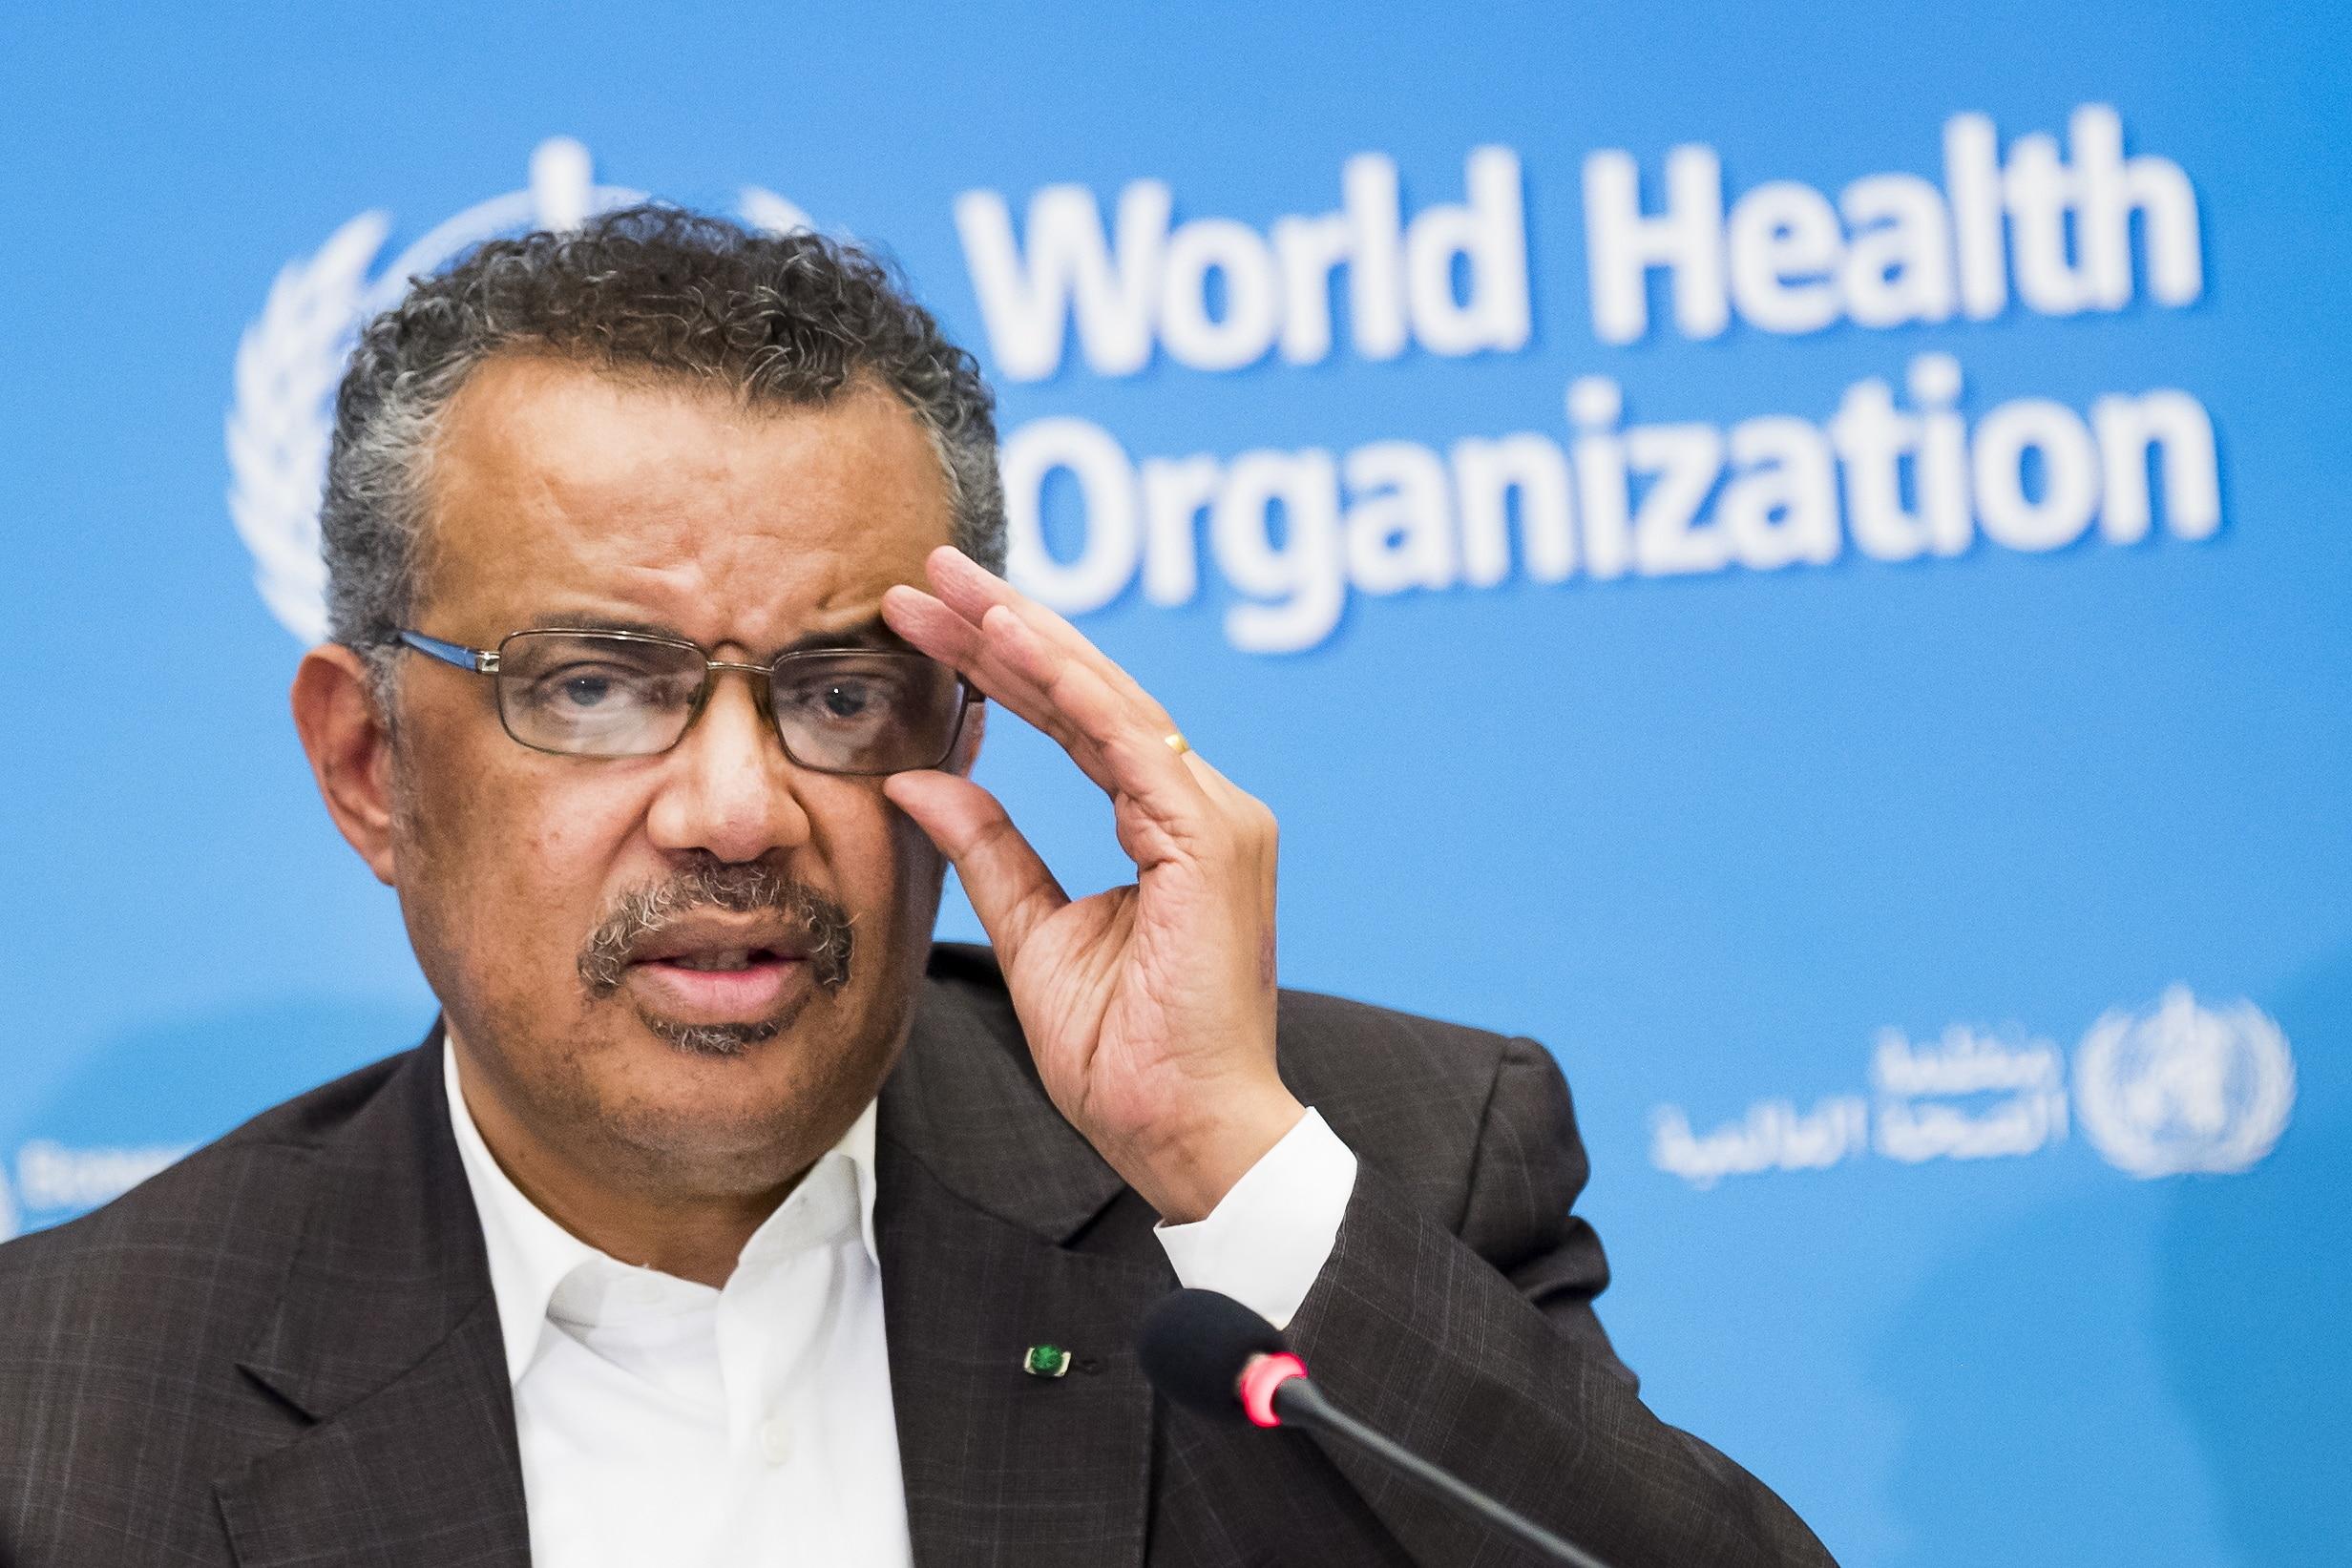 Tedros Adhanom Ghebreyesus, Director General of the World Health Organisation (WHO).